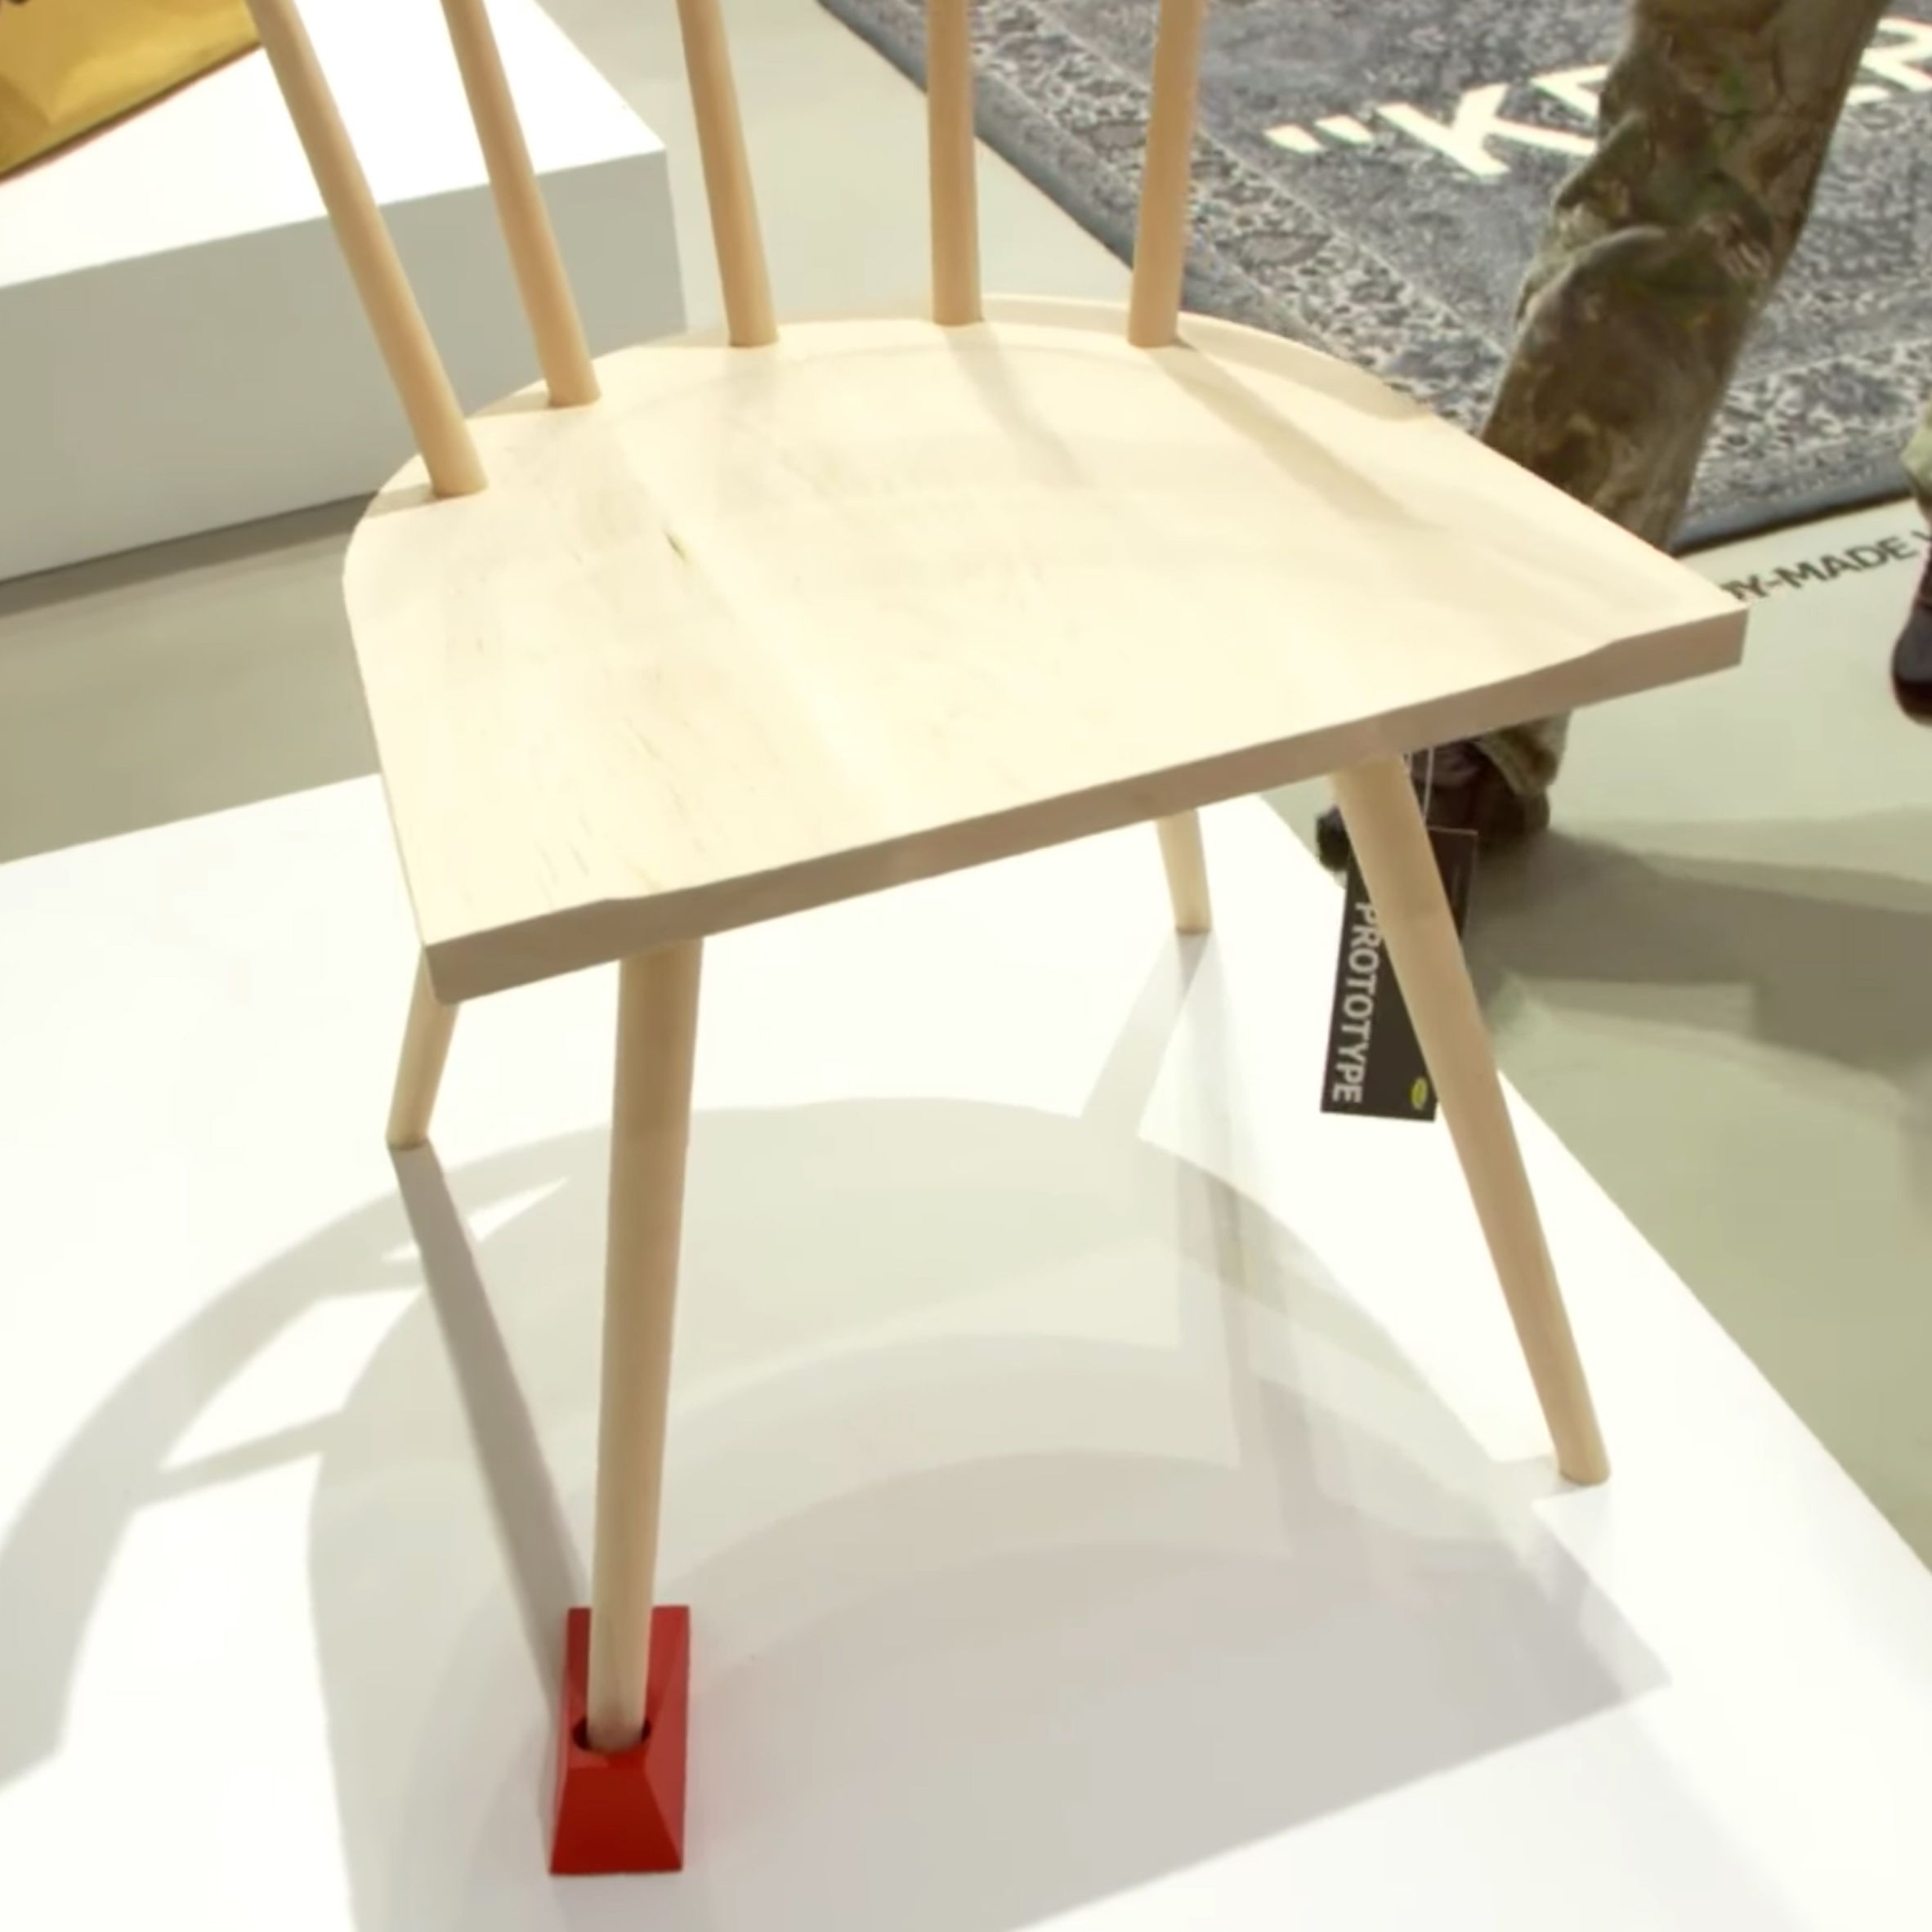 Ikea Offers First Look At Furniture Designed For Millennials By Virgil Abloh Furniture Furniture Design Furniture Accessories